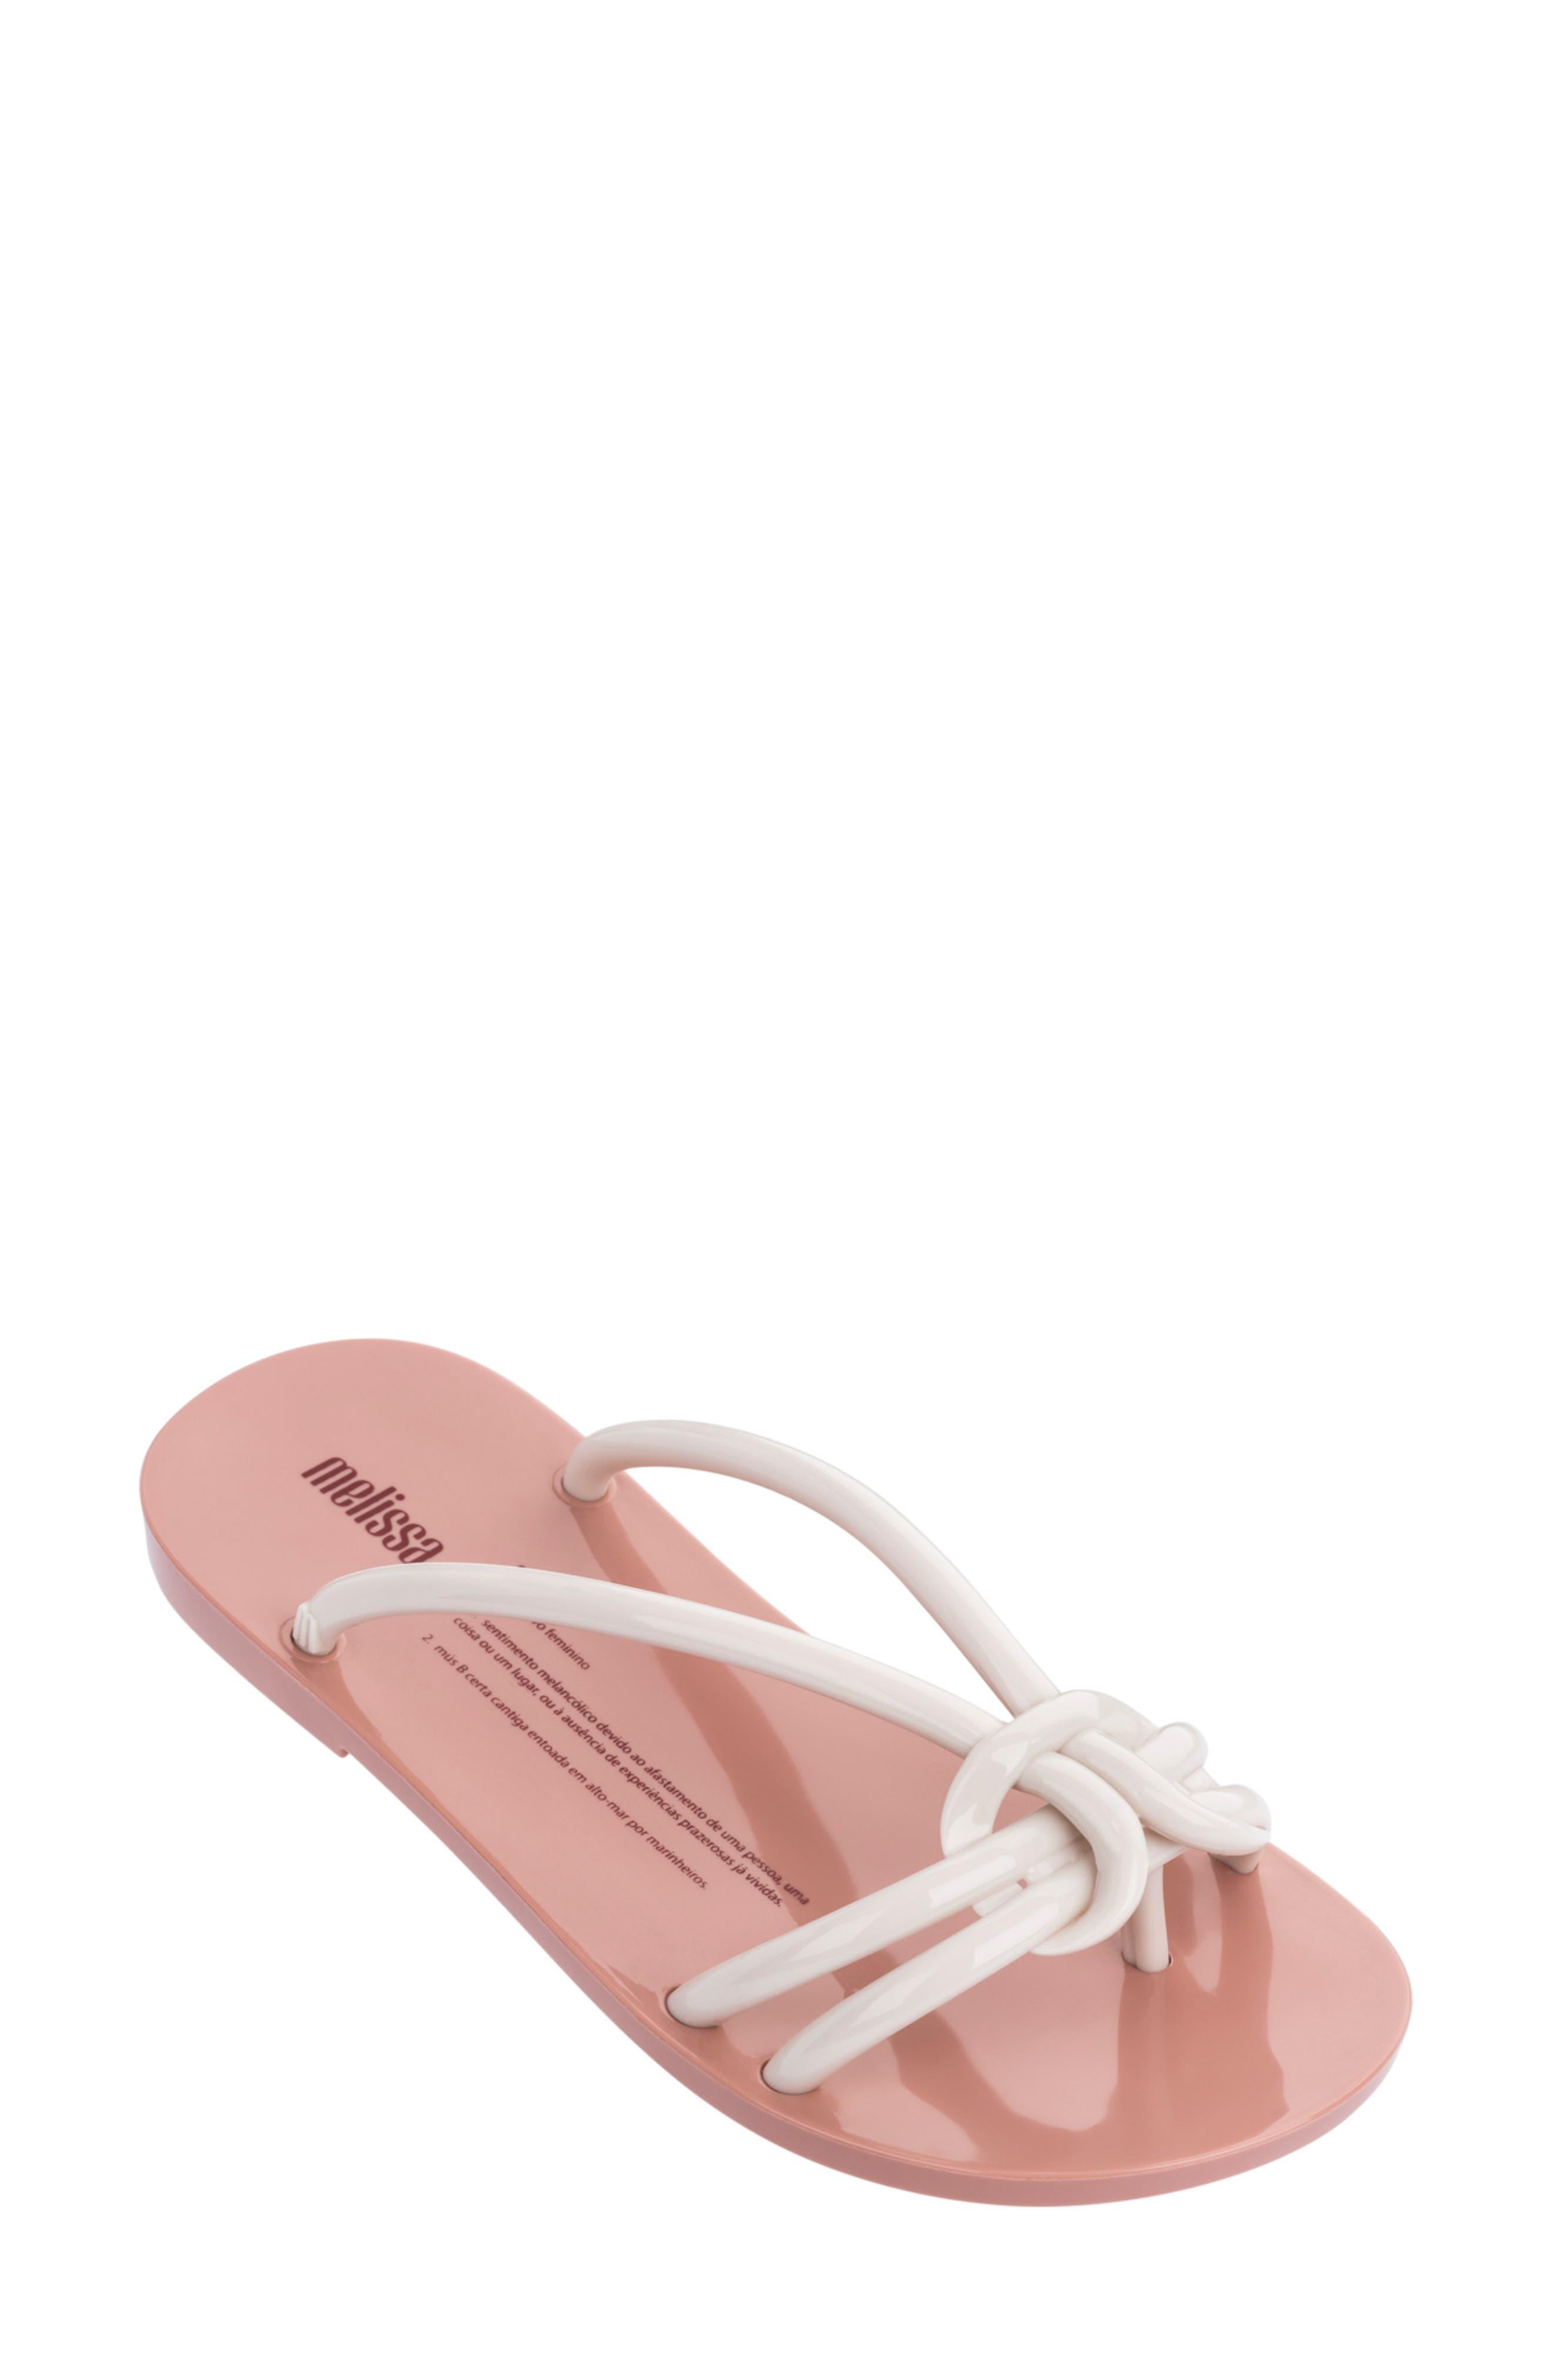 Melissa Saudade Flip Flop, White